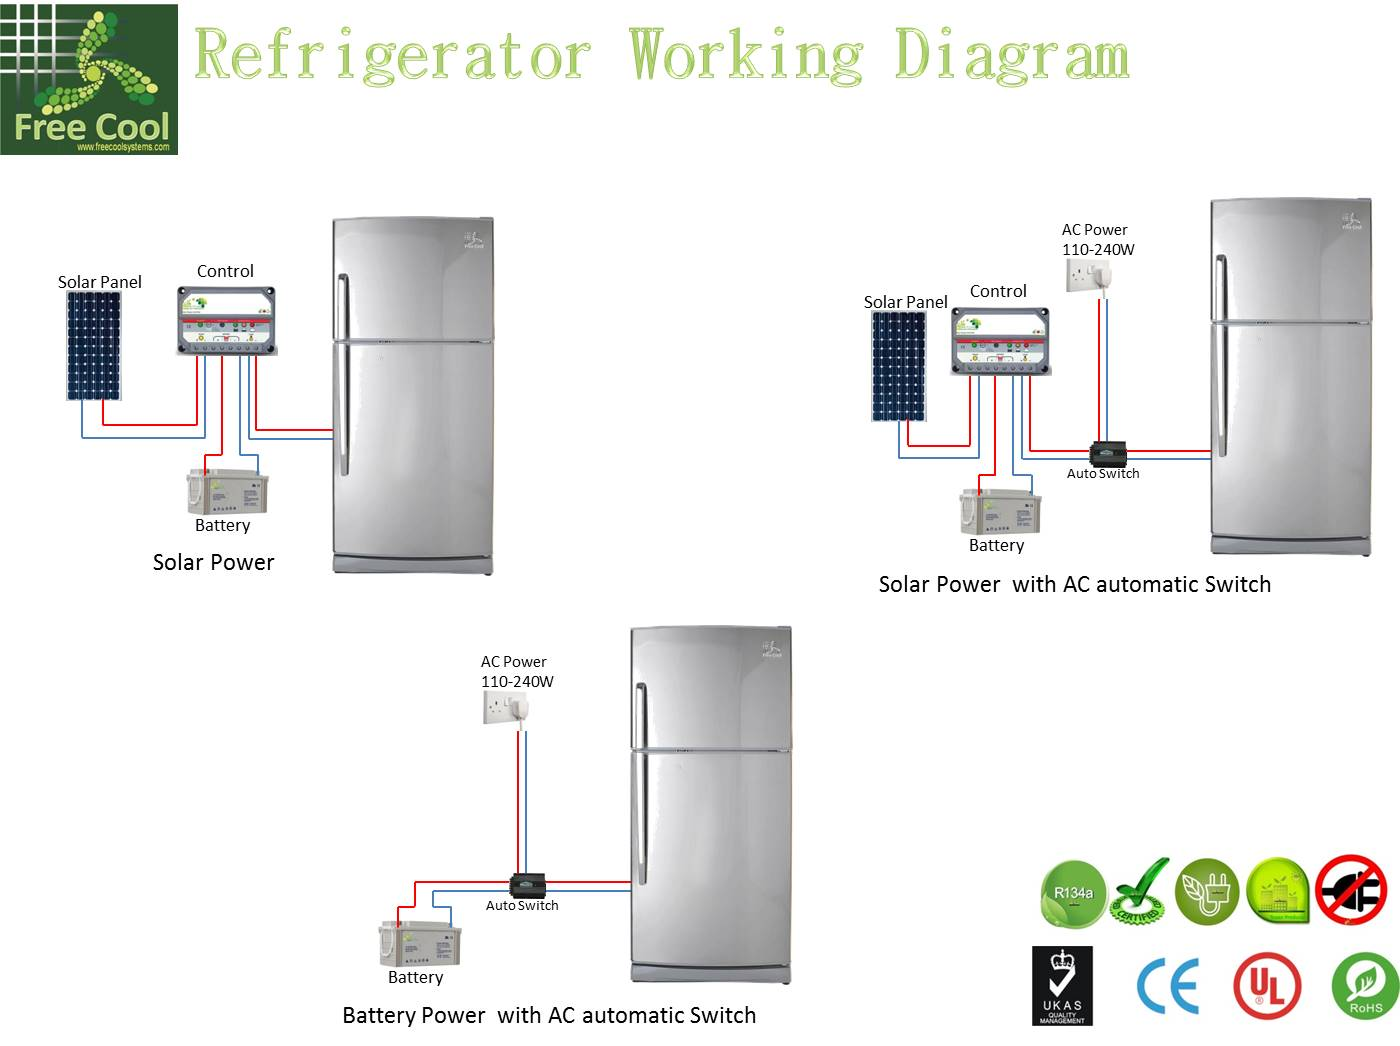 how a freezer works diagram 2003 kia sorento engine free cool systems home